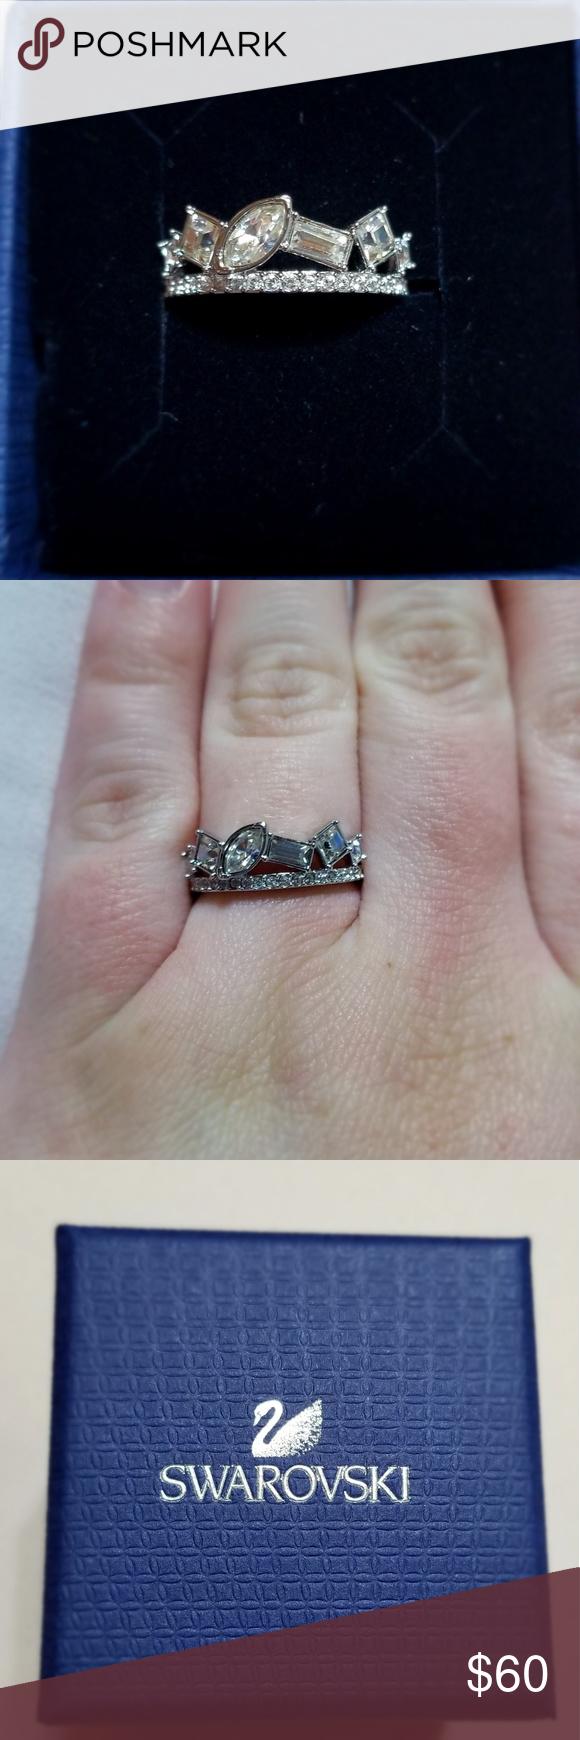 ddf3039ba Henrietta Ring Broken tiara ring, rhodium plated (will not tarnish). Size  6. Comes with original tag in original box. Swarovski Jewelry Rings